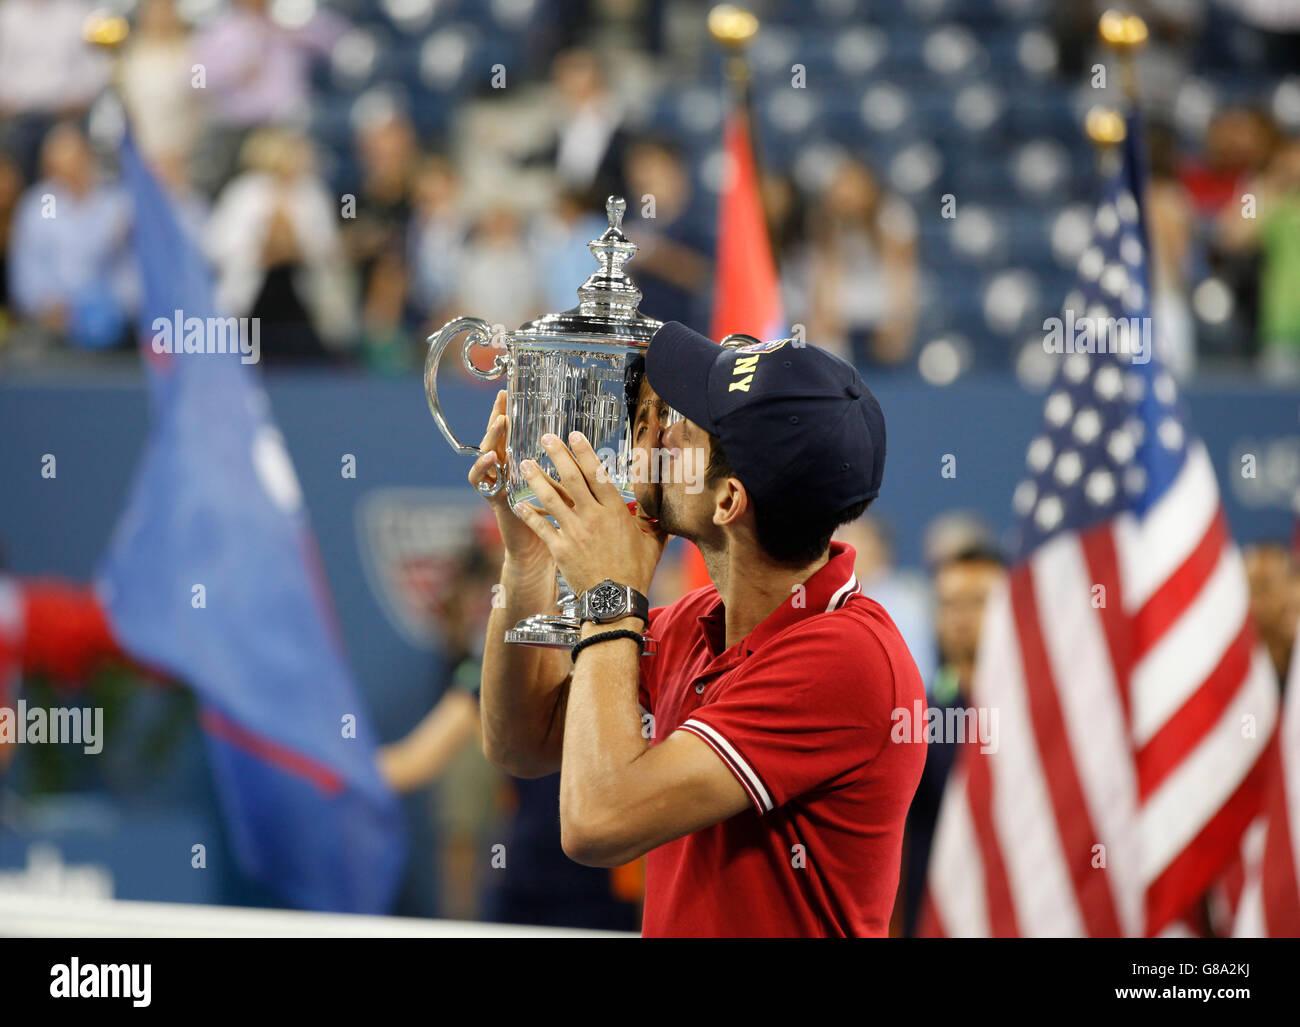 Awards ceremony, Novak Djokovic, SRB, winner of the men's final kissing his trophy, ITF Grand Slam tennis tournament, - Stock Image